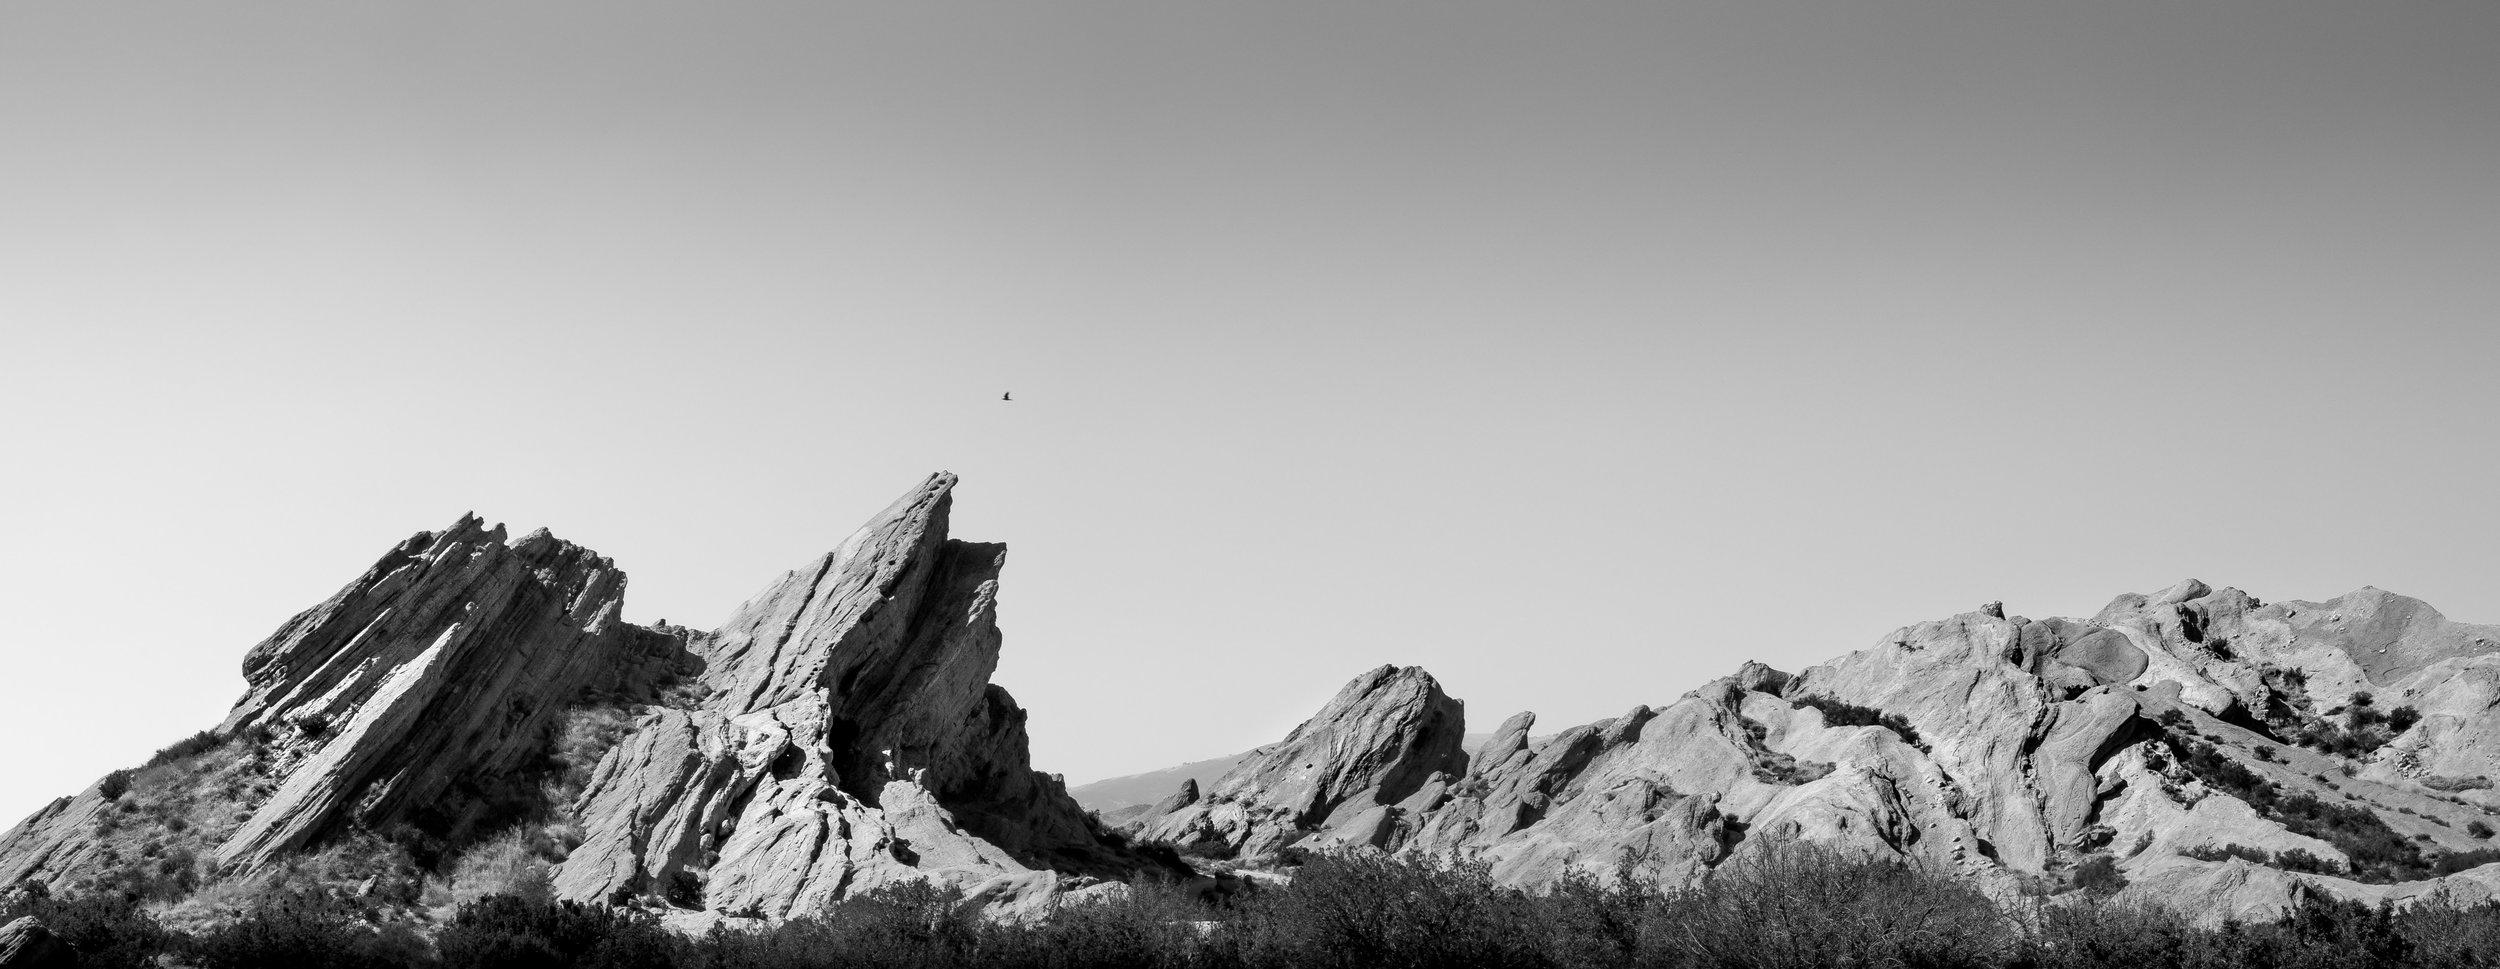 super-rocks-pano.jpg